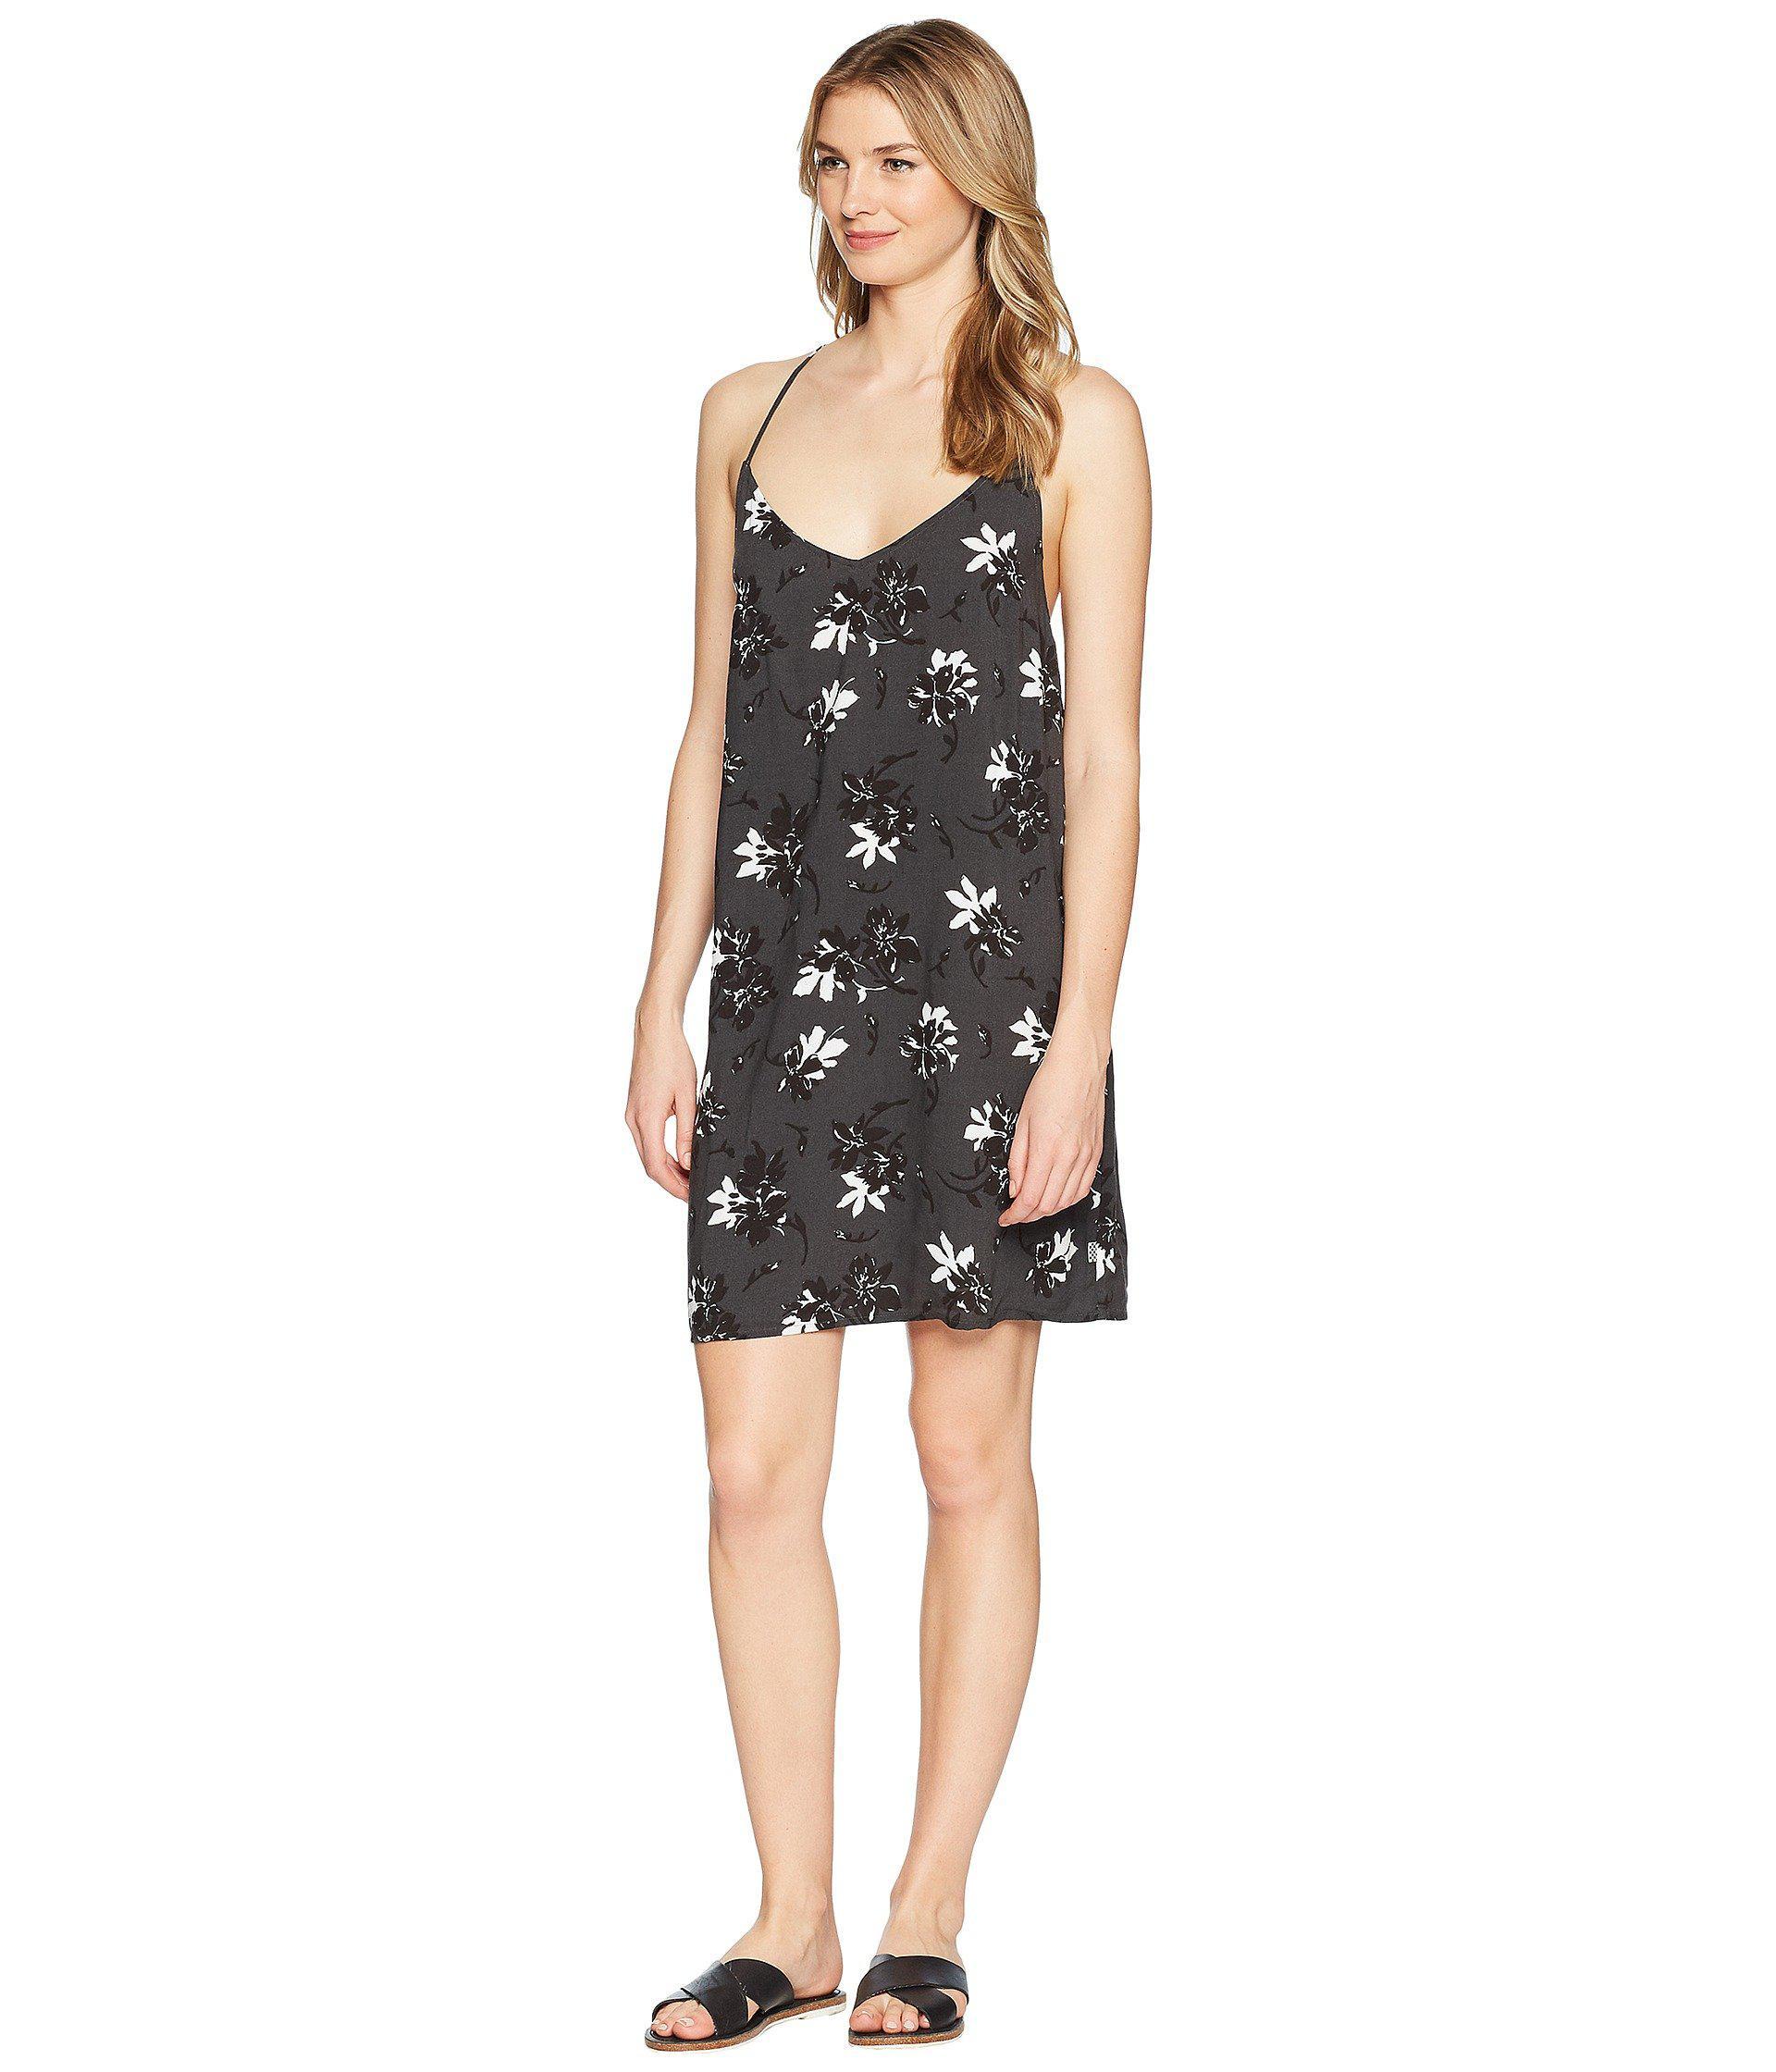 5005e30722 Lyst - Vans Maria Dress in Black